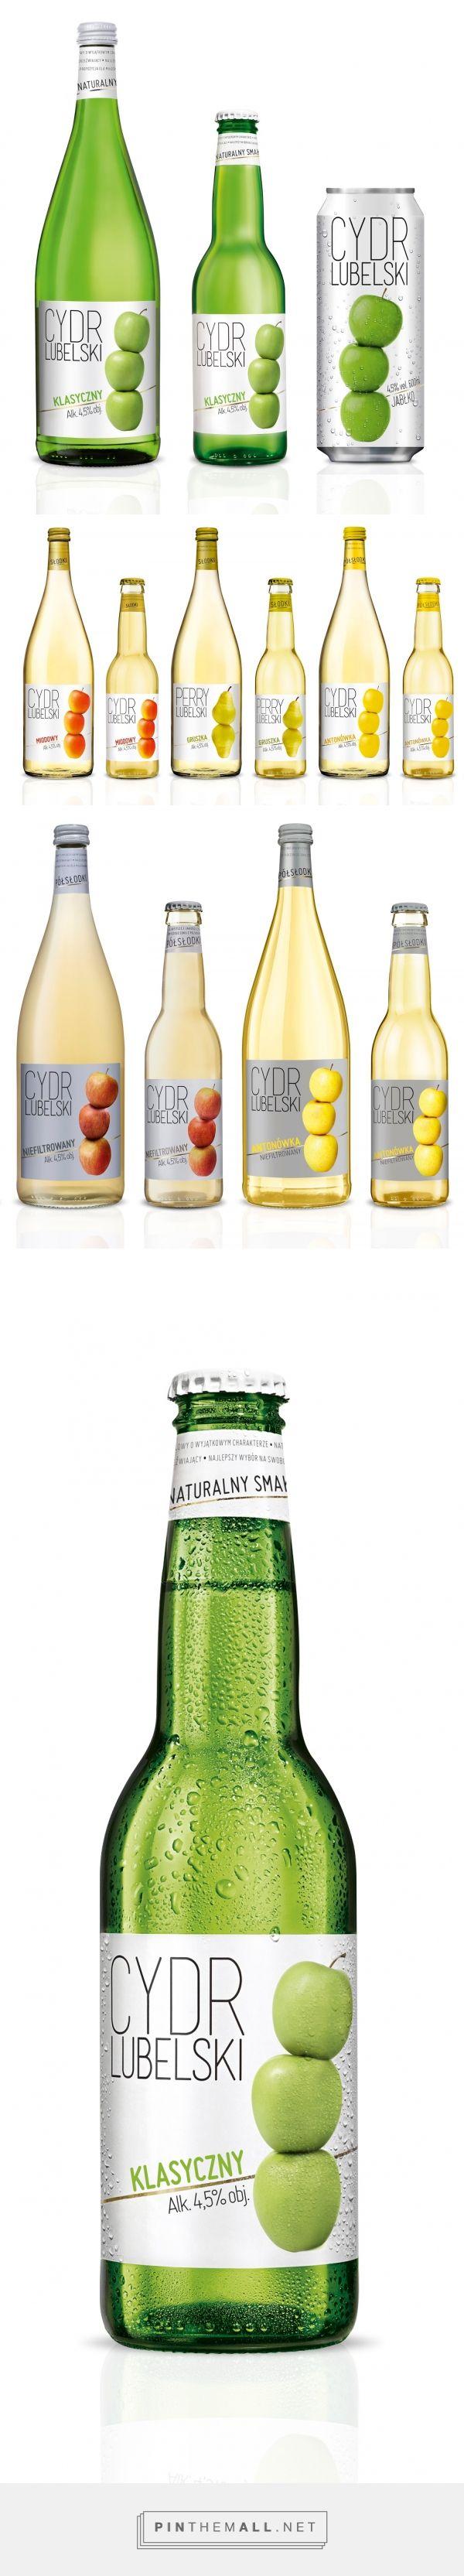 Lubelski Cider - Packaging of the World - Creative Package Design Gallery - http://www.packagingoftheworld.com/2017/02/lubelski-cider.html